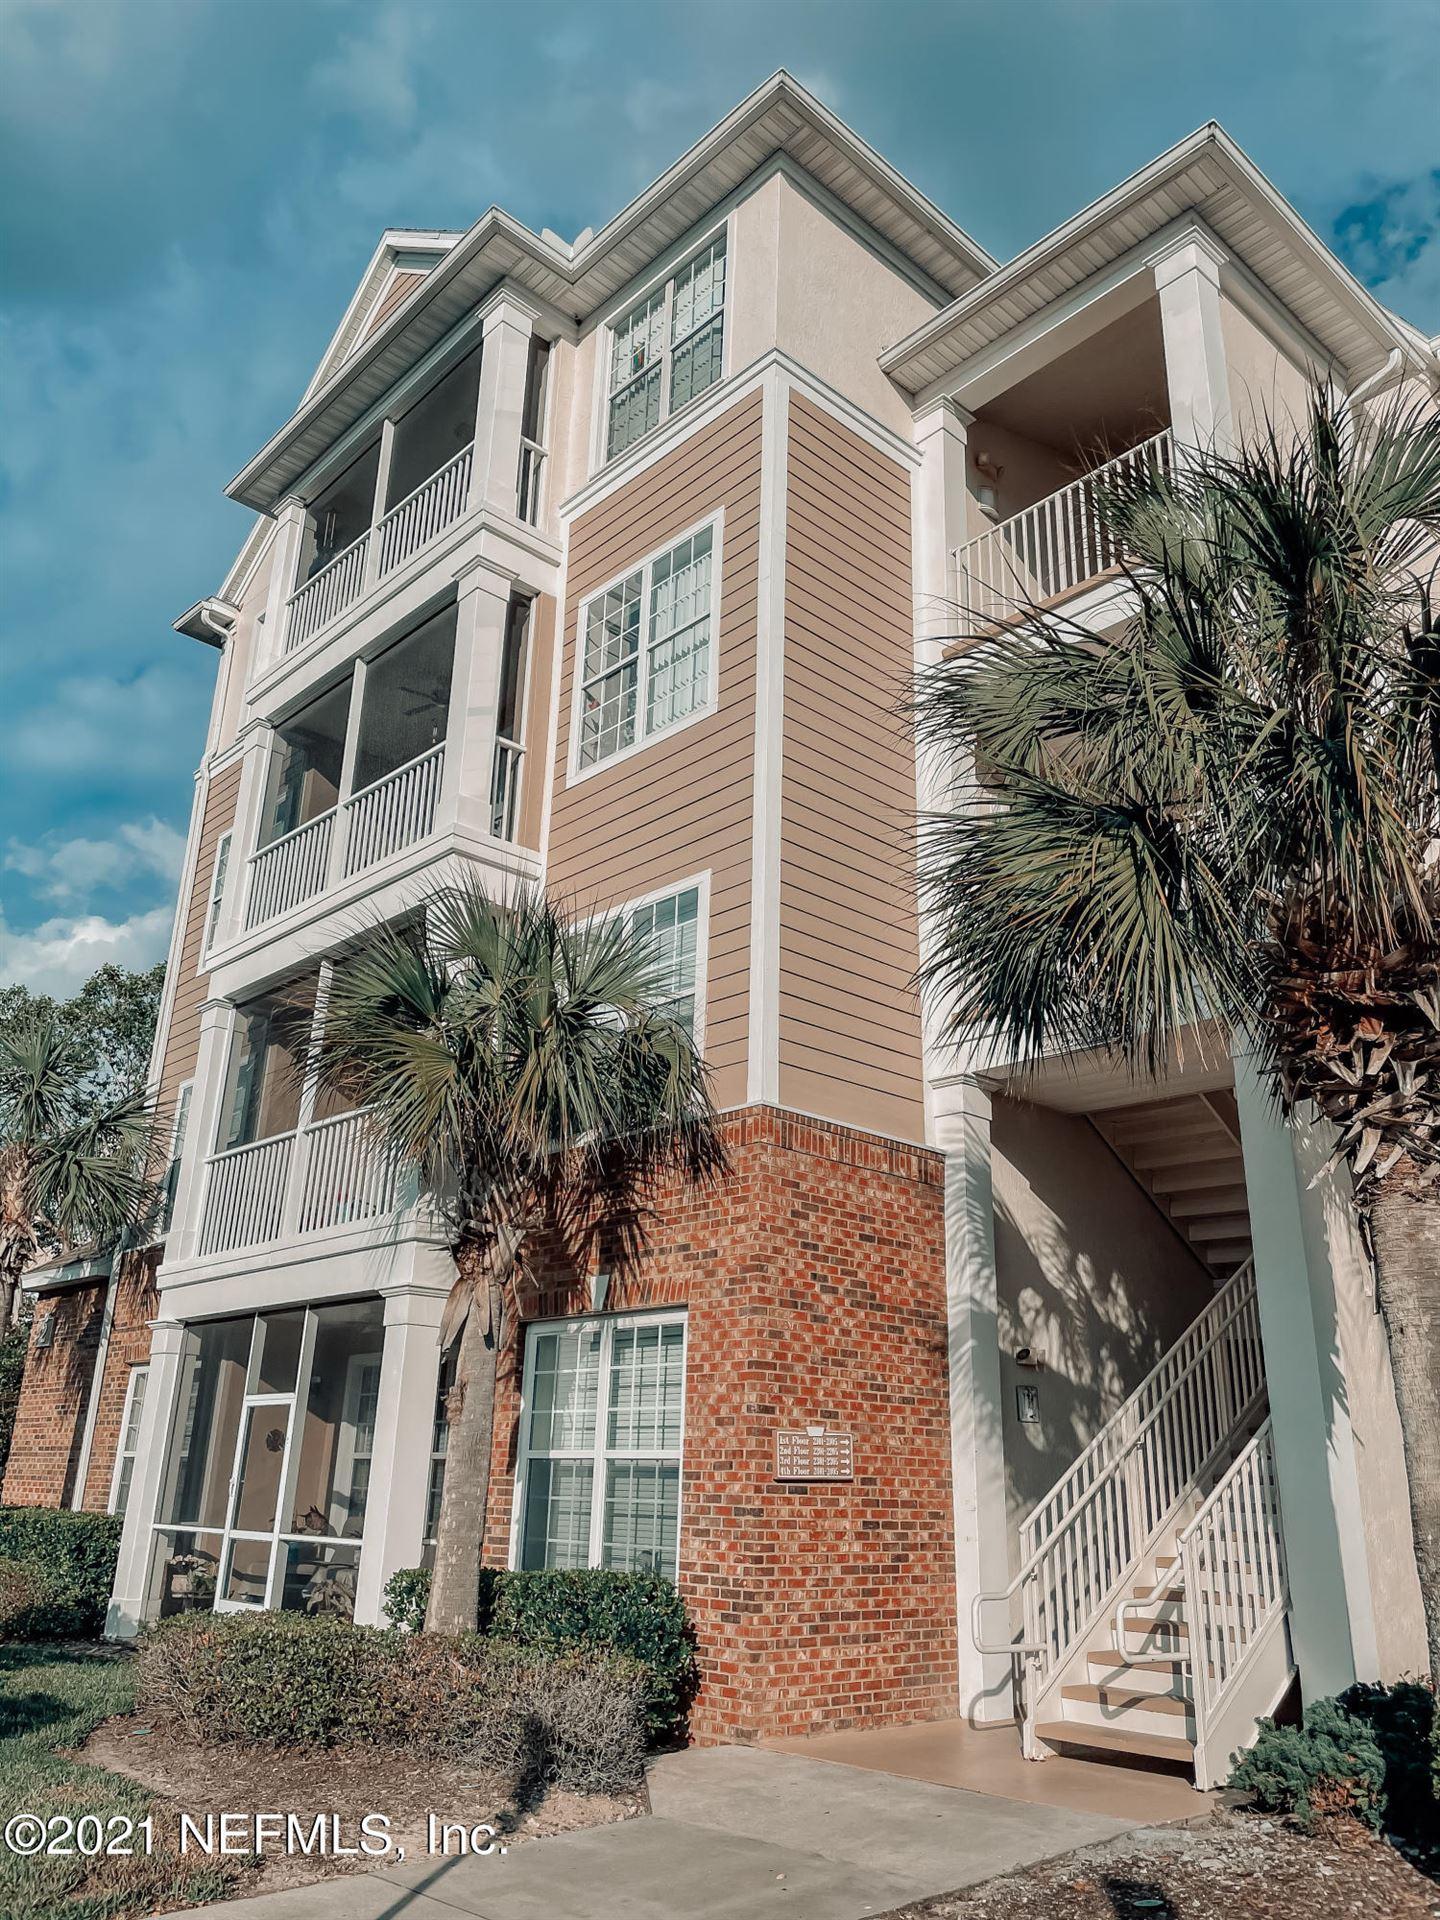 11251 CAMPFIELD DR, Jacksonville, FL 32256 - MLS#: 1113495